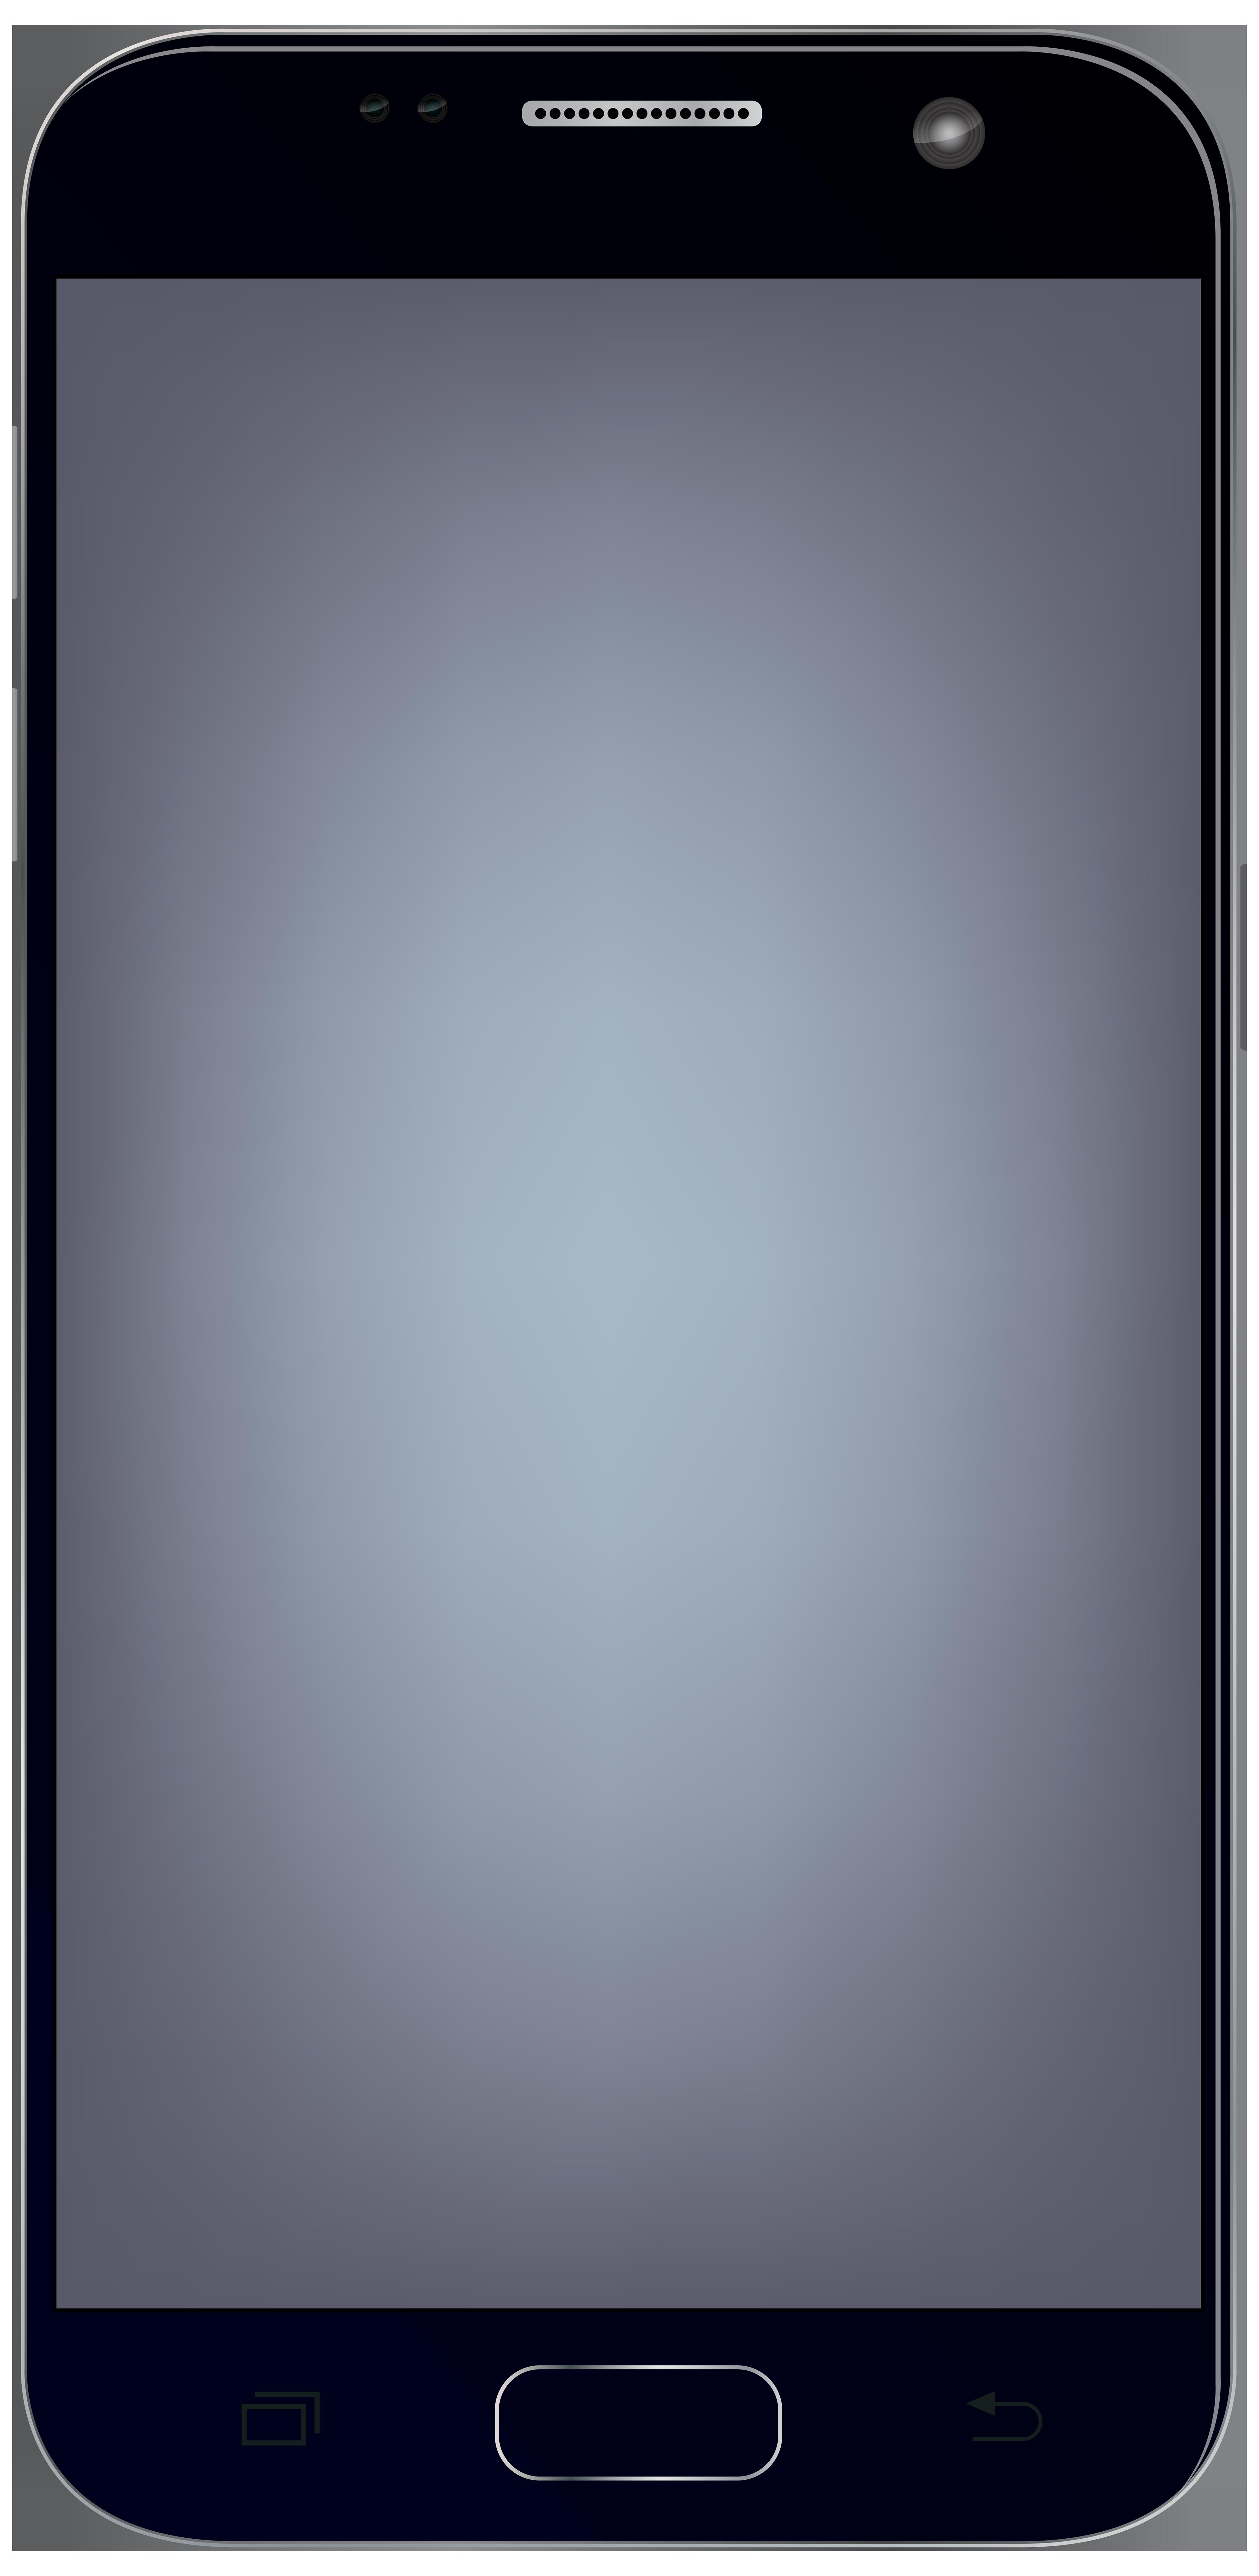 Smartphone Clip Art, Smartphone Free Clipart.